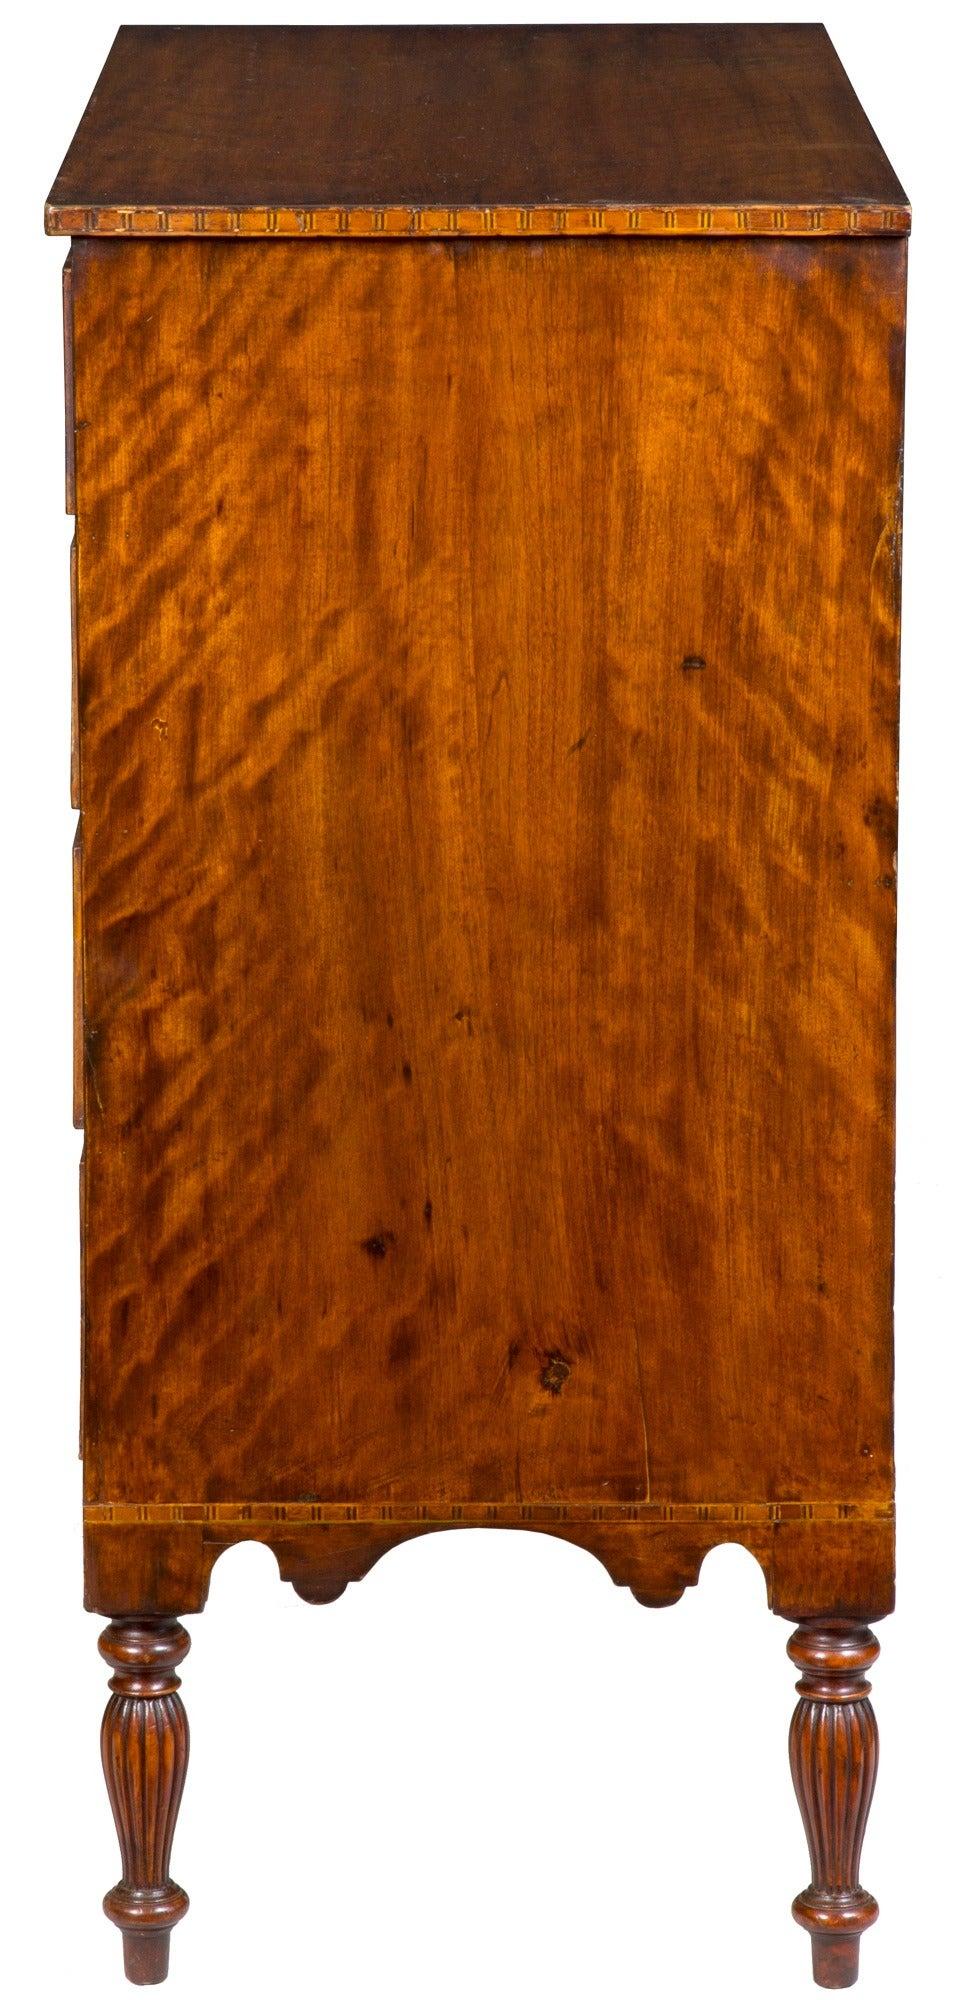 American Hepplewhite Mahogany, Birch Inlaid Chest of Drawers, New Hampshire, circa 1815 For Sale